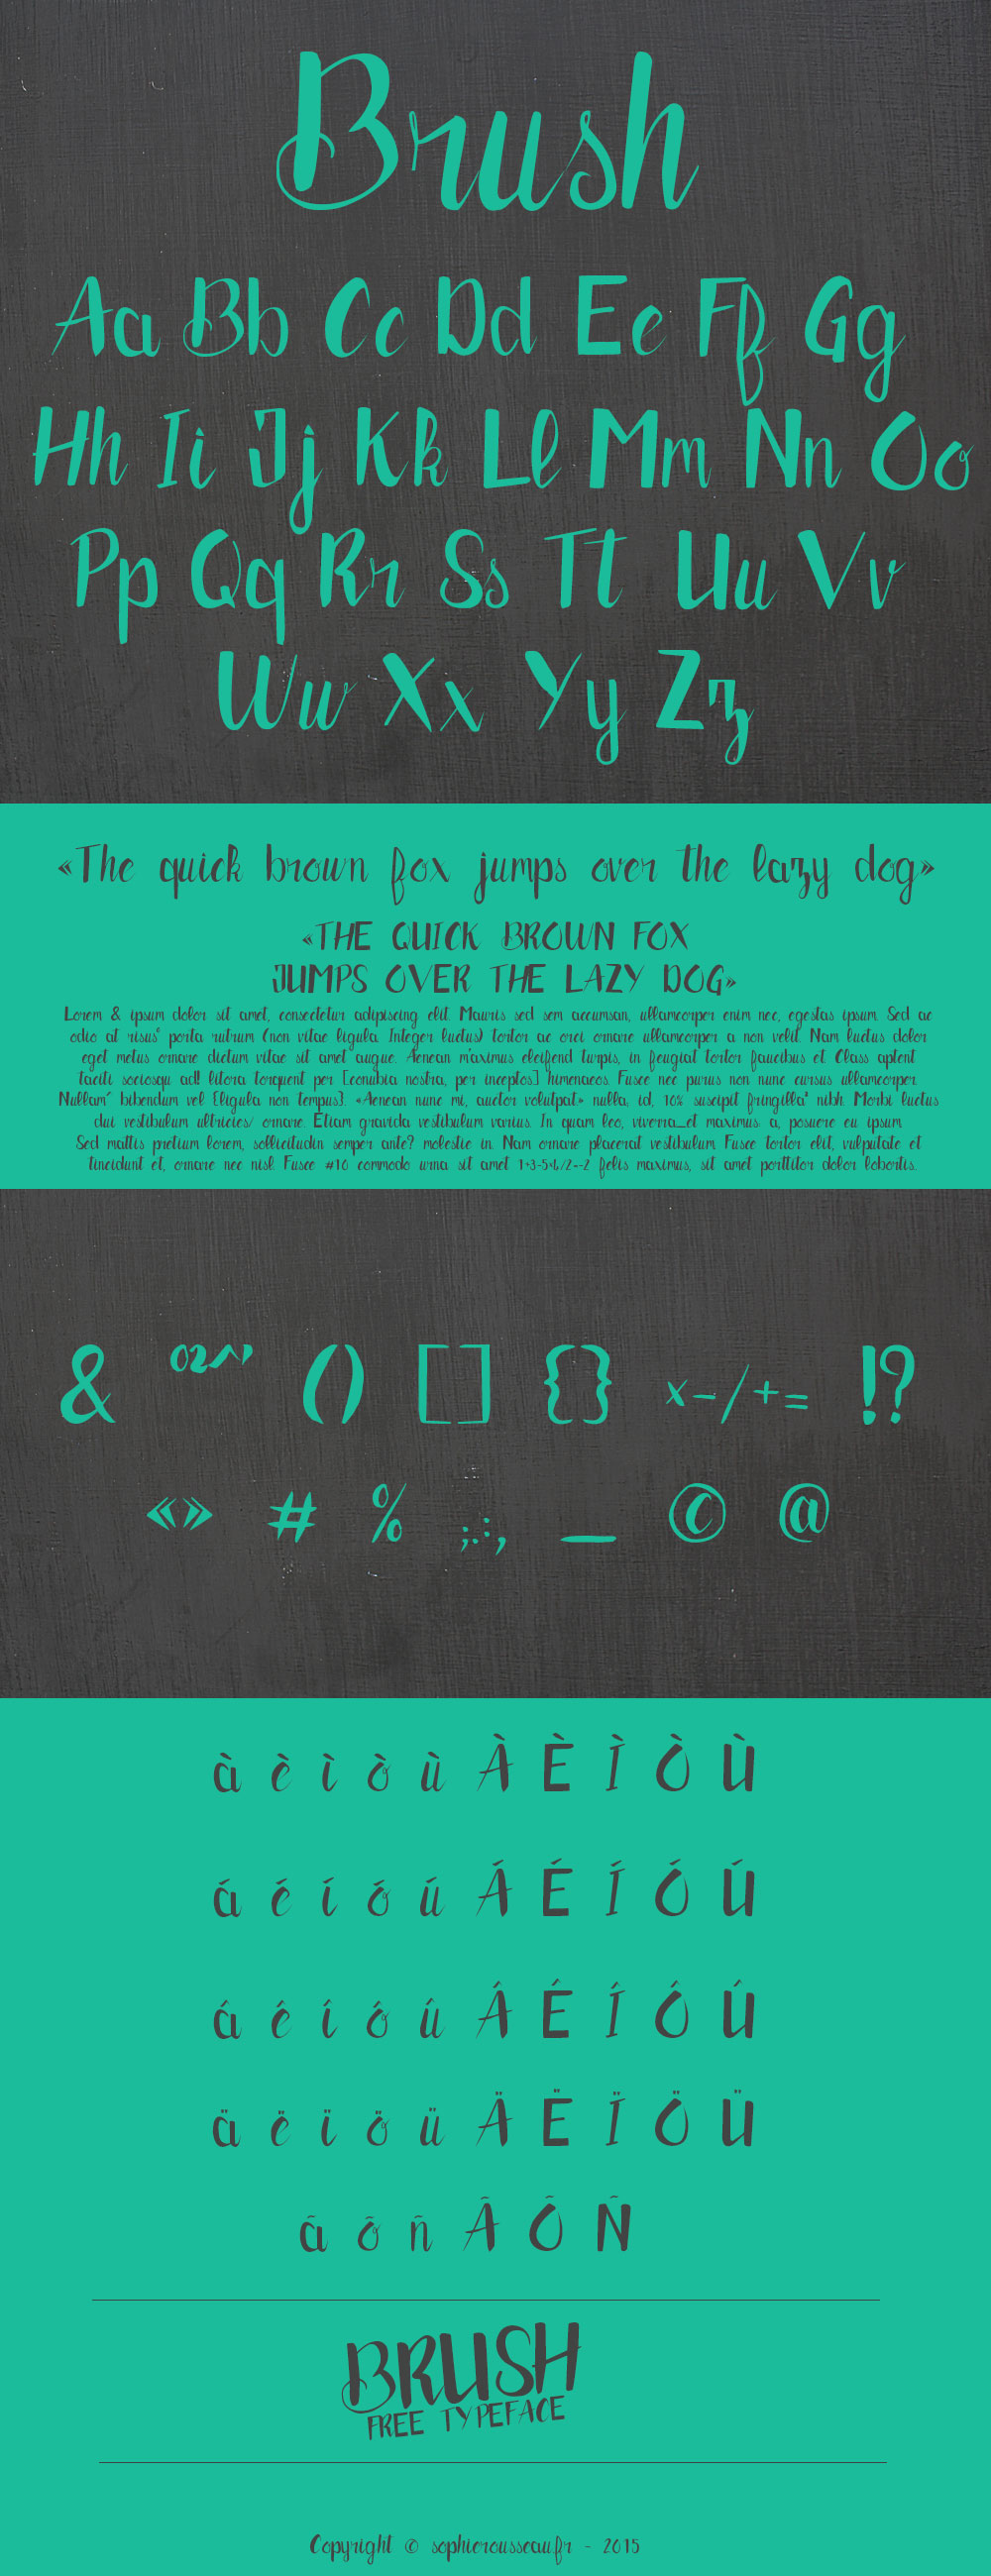 brush typeface banner